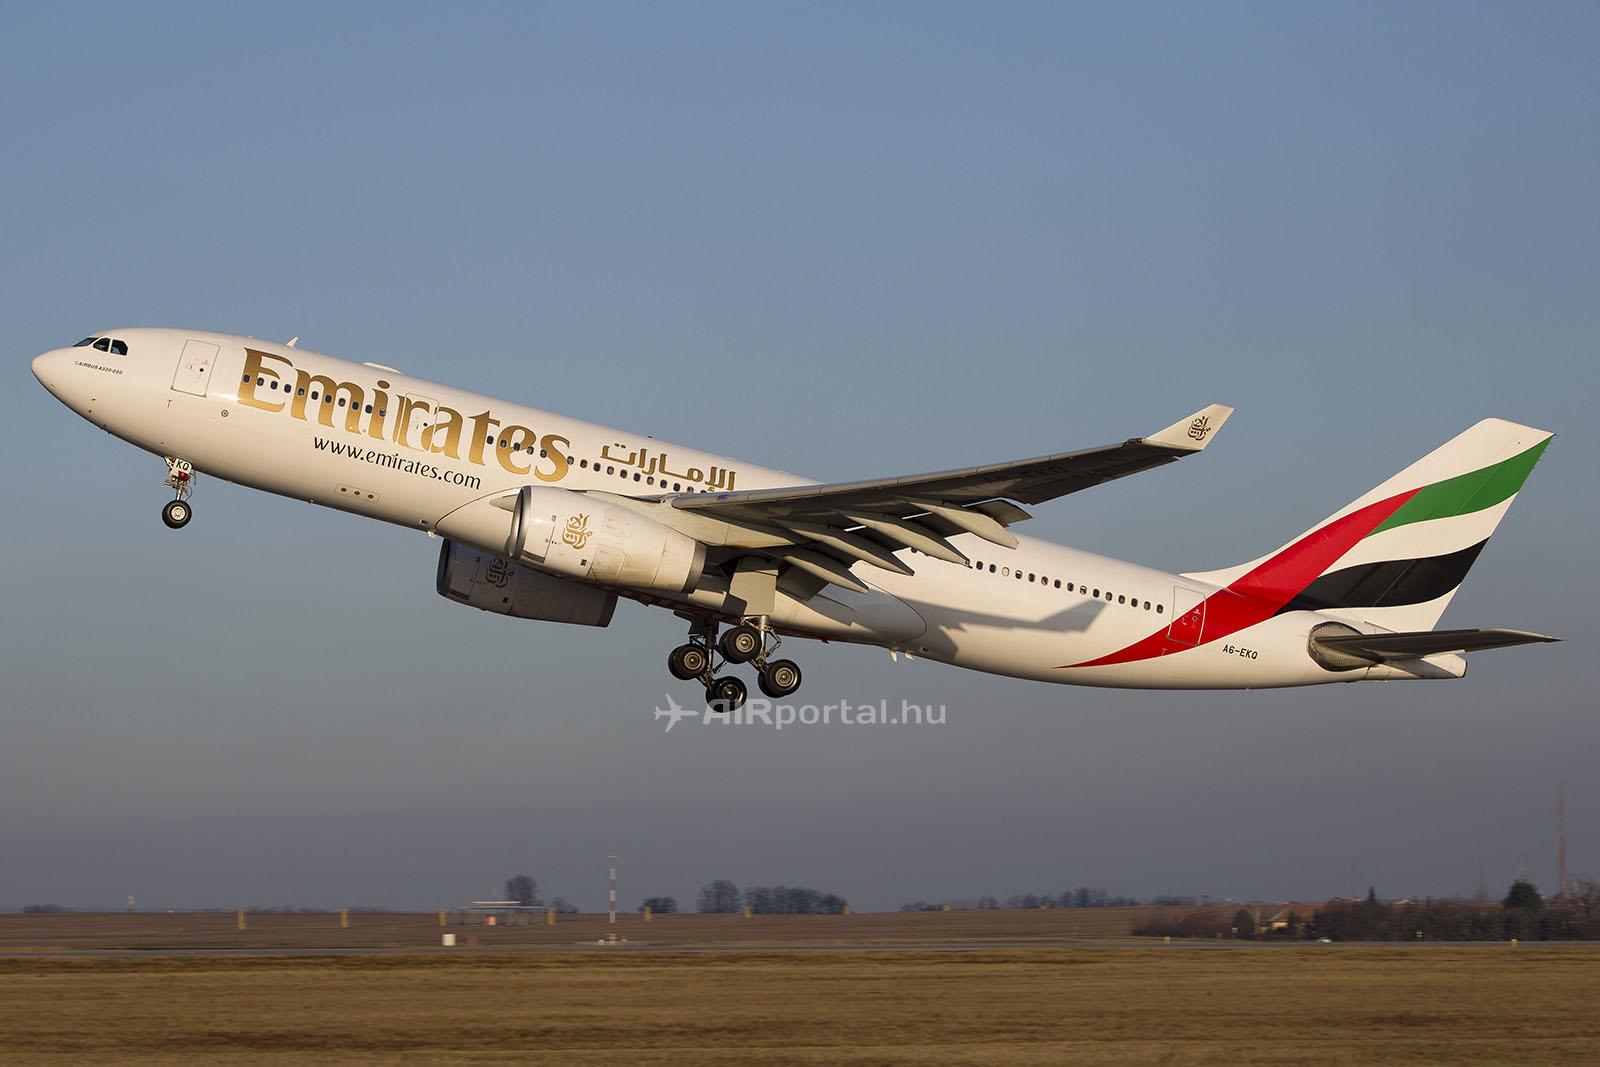 Az Emirates eleinte Budapestre is Airbus A330-asokkal repülte járatait. (Fotó: AIRportal.hu) | © AIRportal.hu